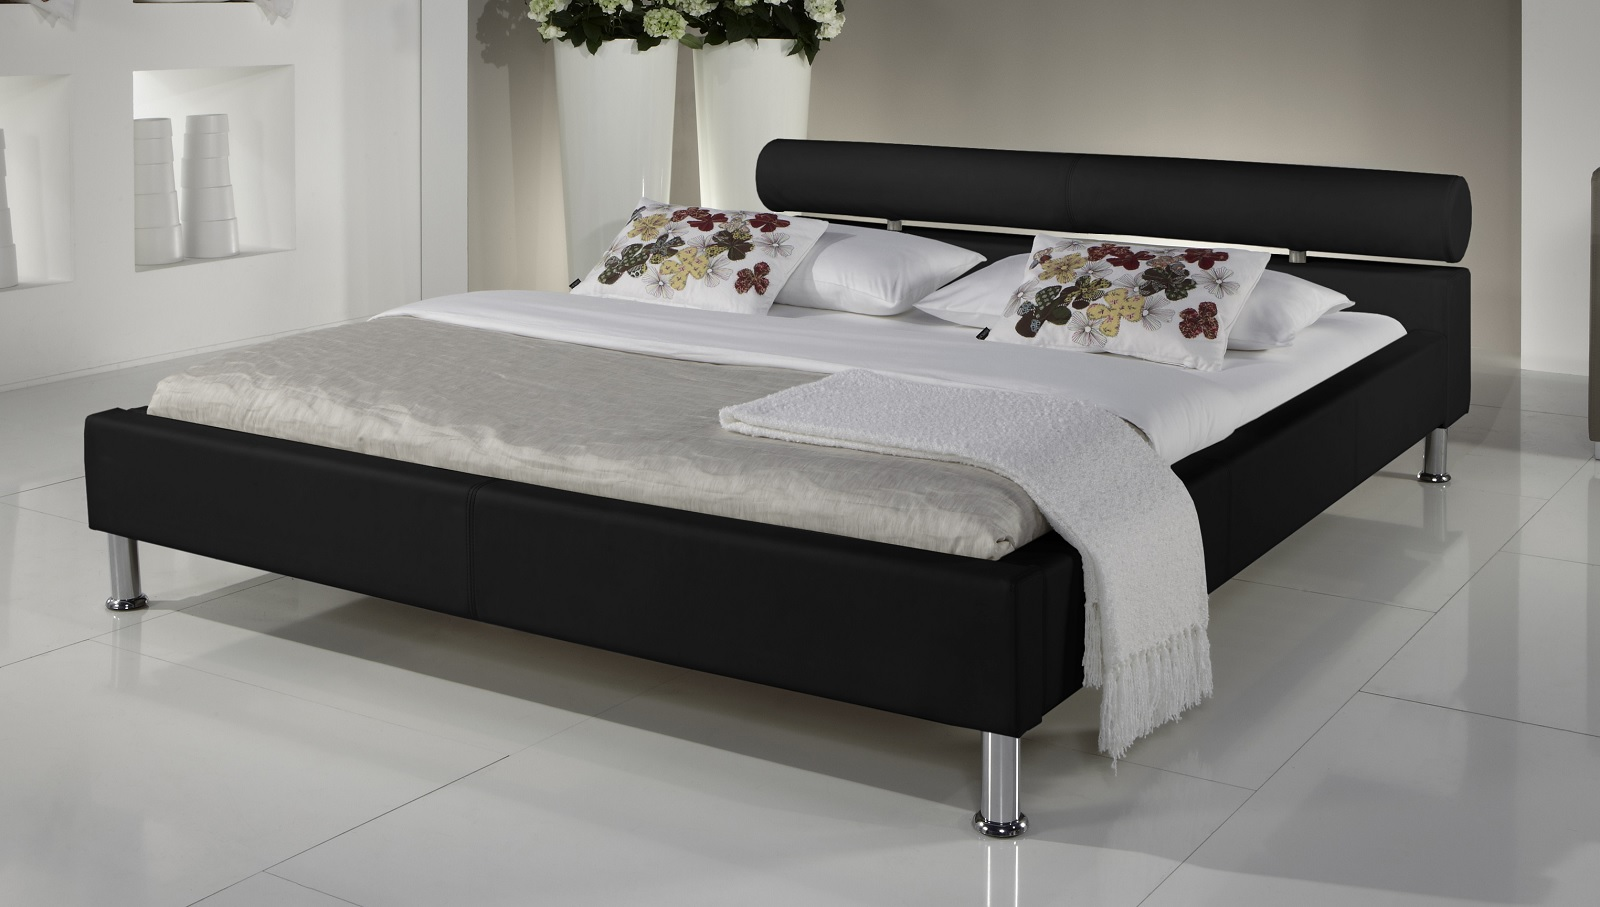 polsterbett ornella schwarz polsterbetten betten. Black Bedroom Furniture Sets. Home Design Ideas